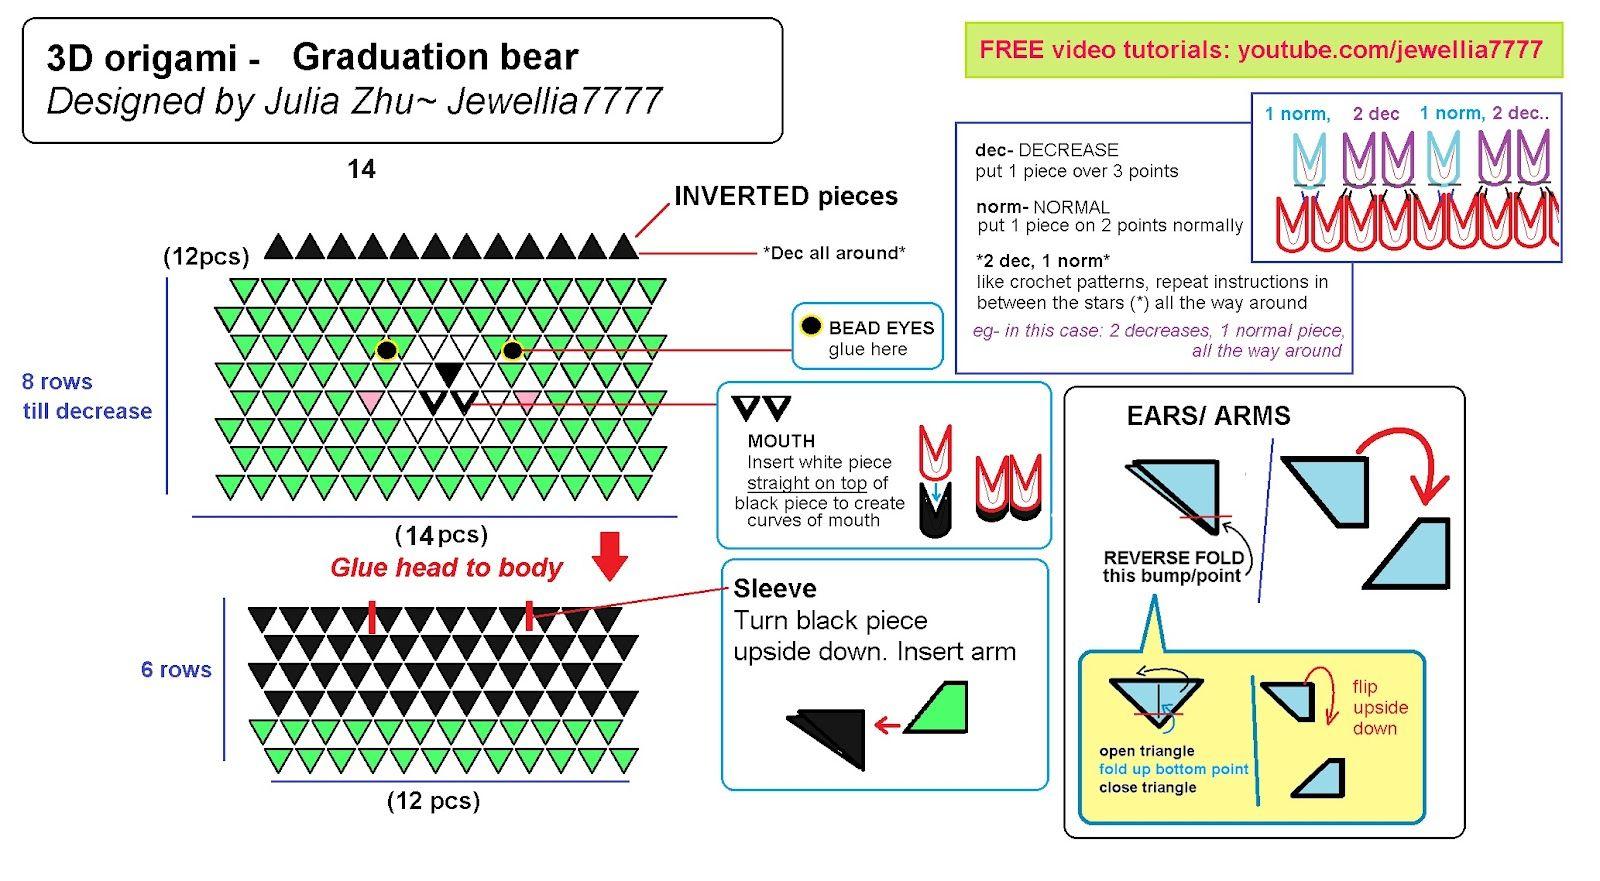 Phenomenal Jewellia Handicrafts New 3D Origami Graduation Bears Diagram Wiring 101 Olytiaxxcnl